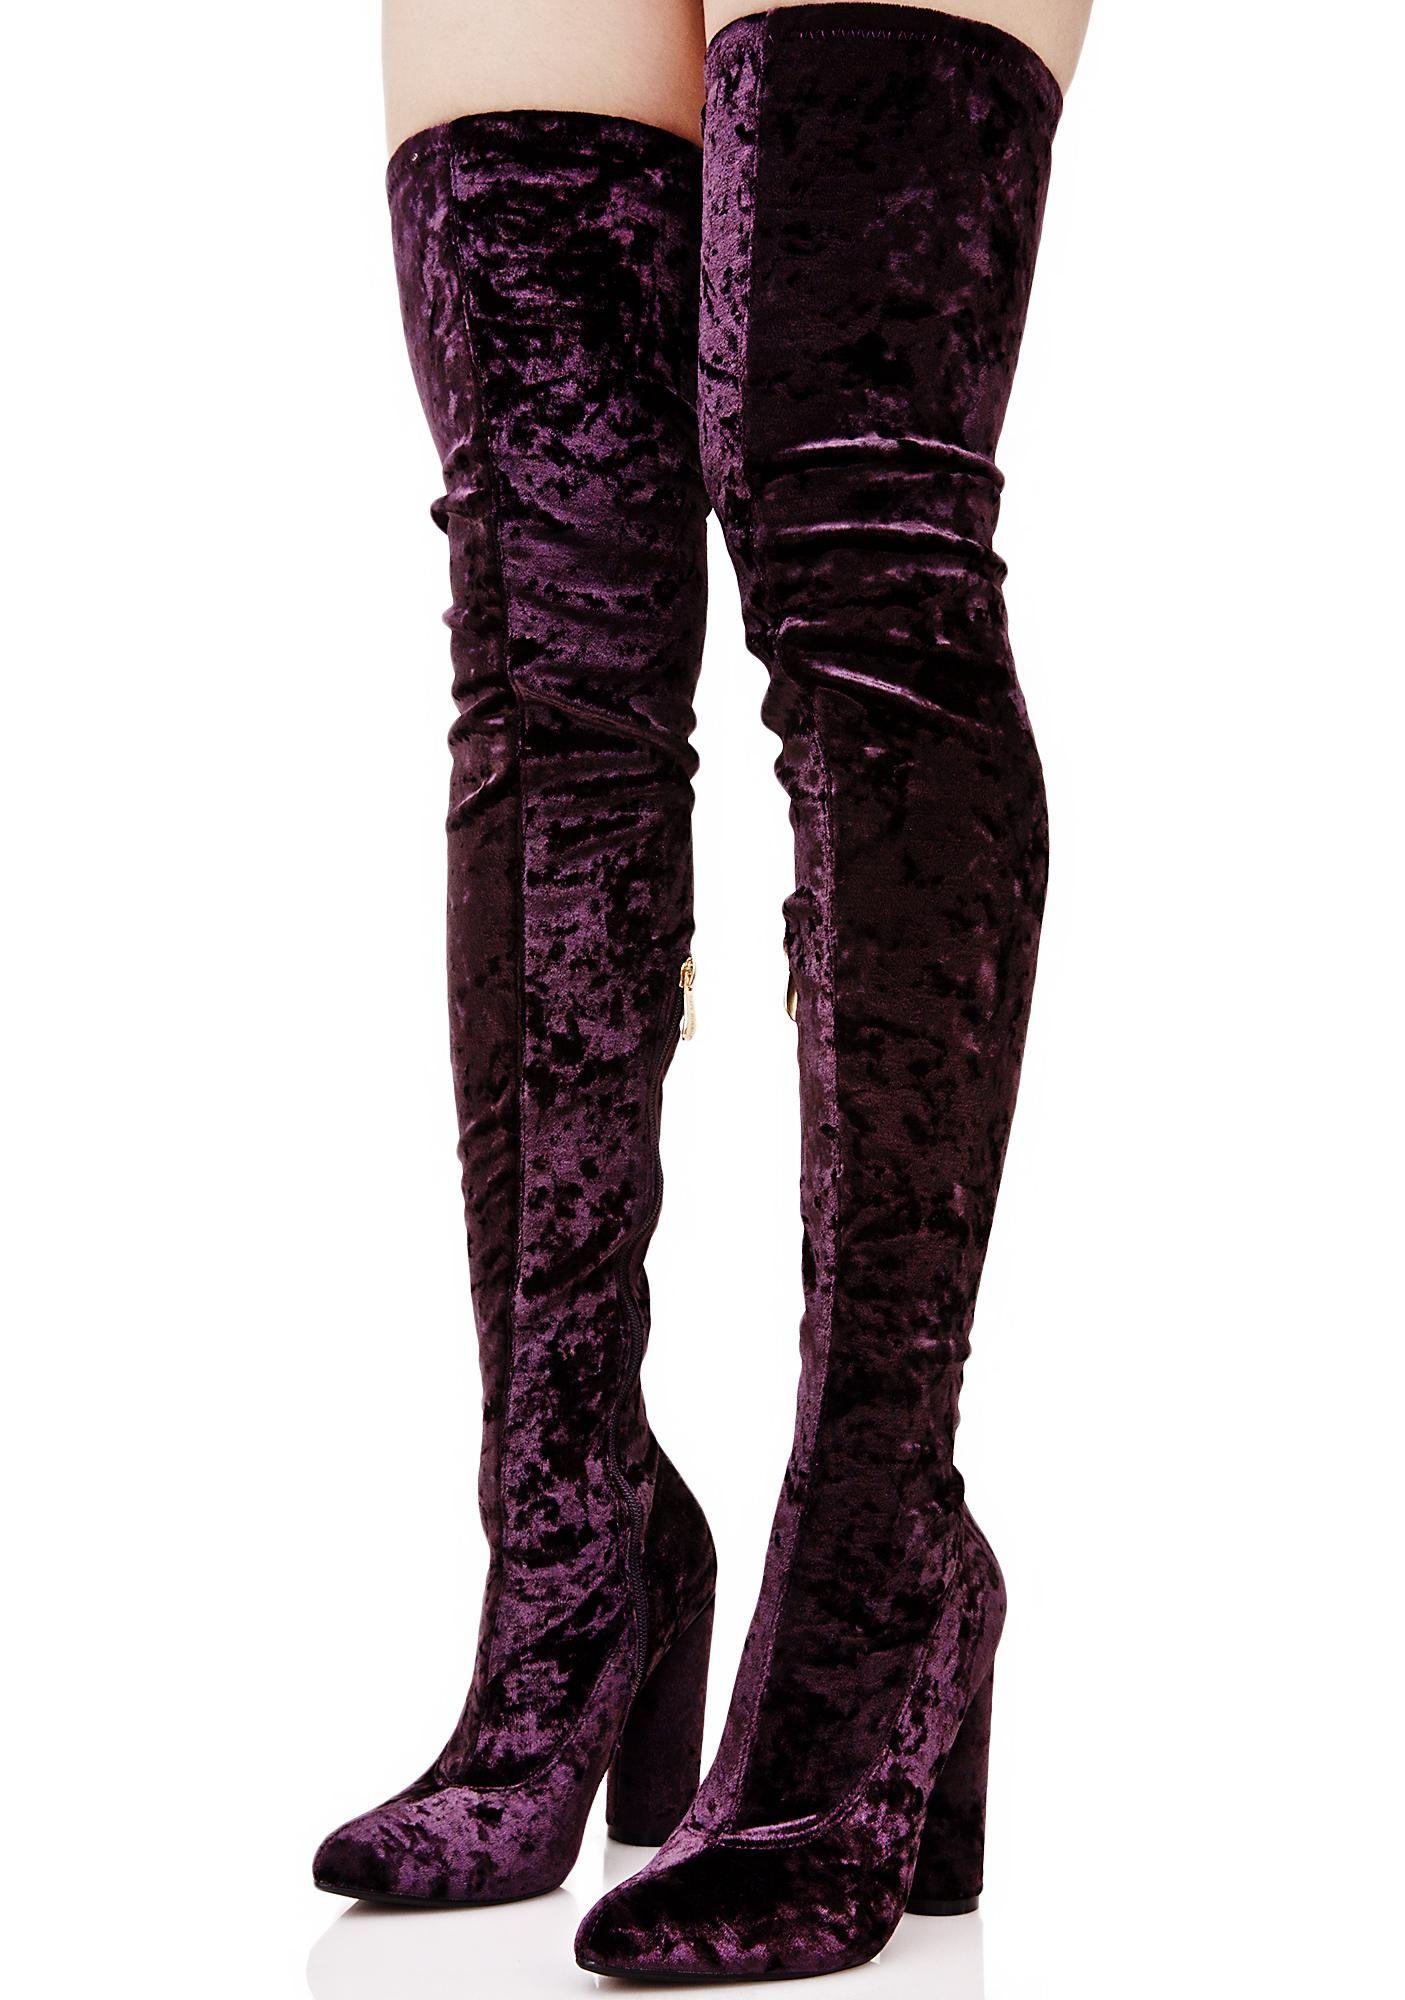 b91edb15d53 Amethyst Planetary Thigh-High Boots